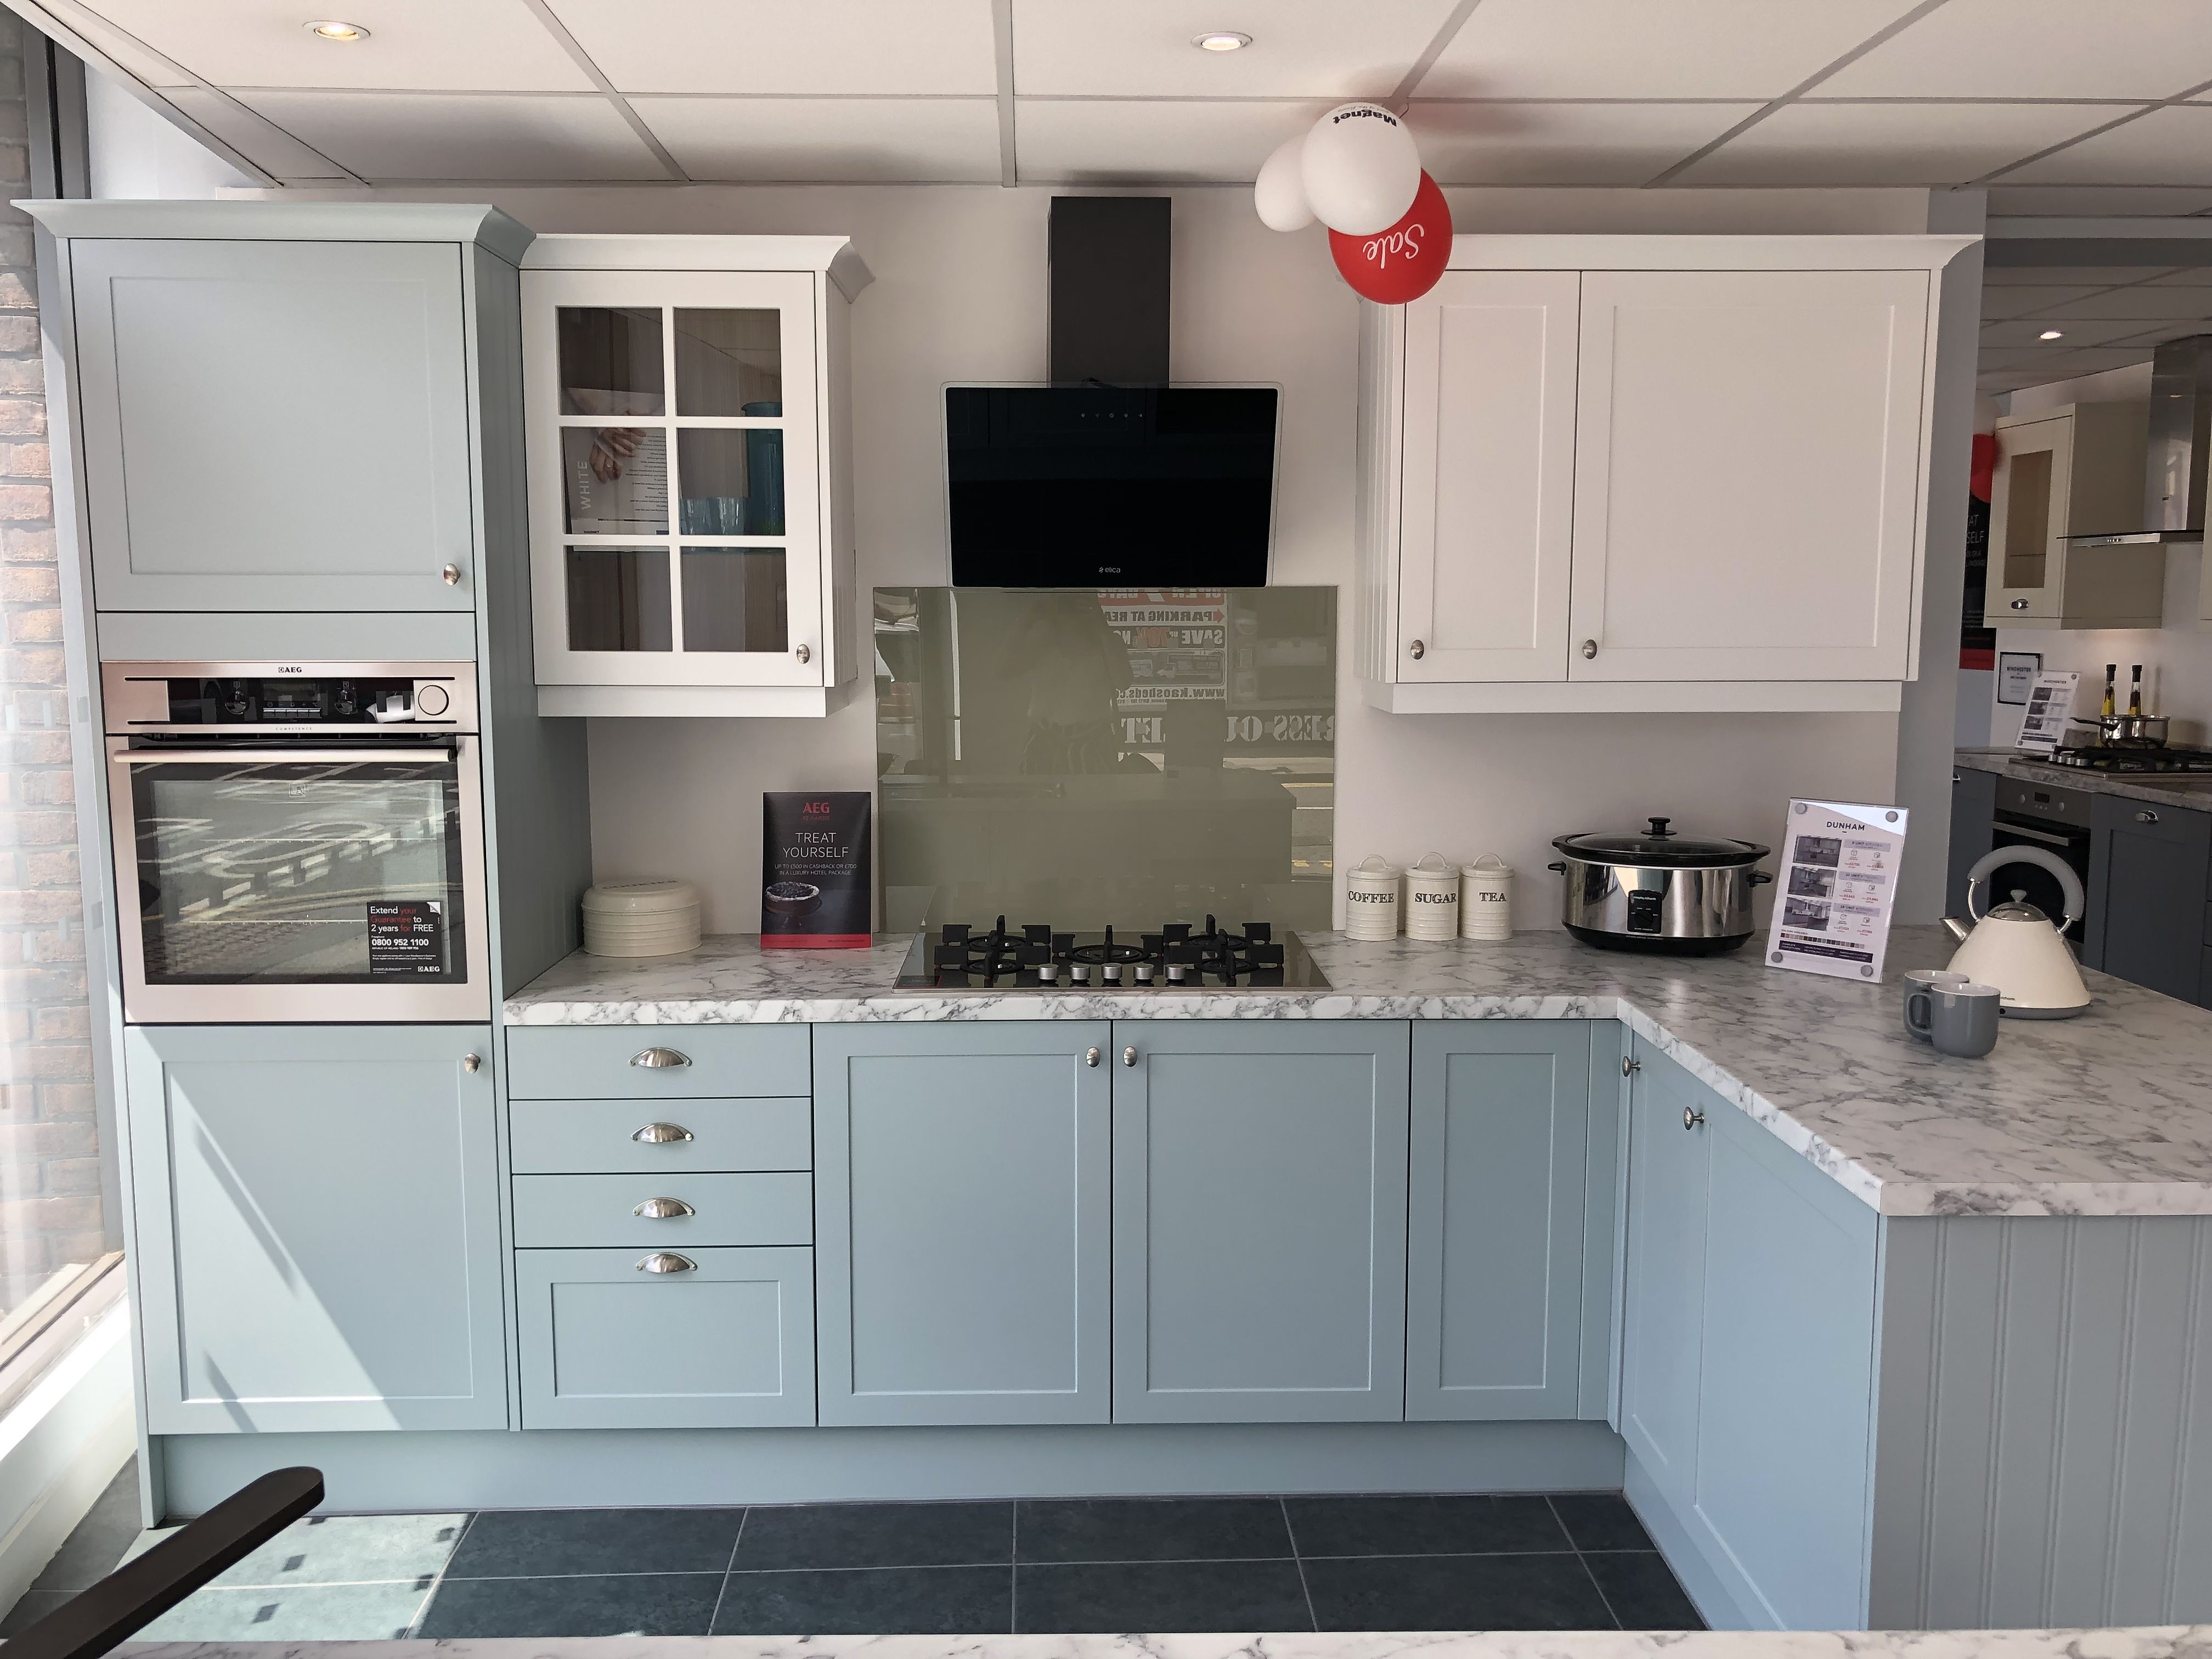 Dunham light blue and white kitchen Shaker style